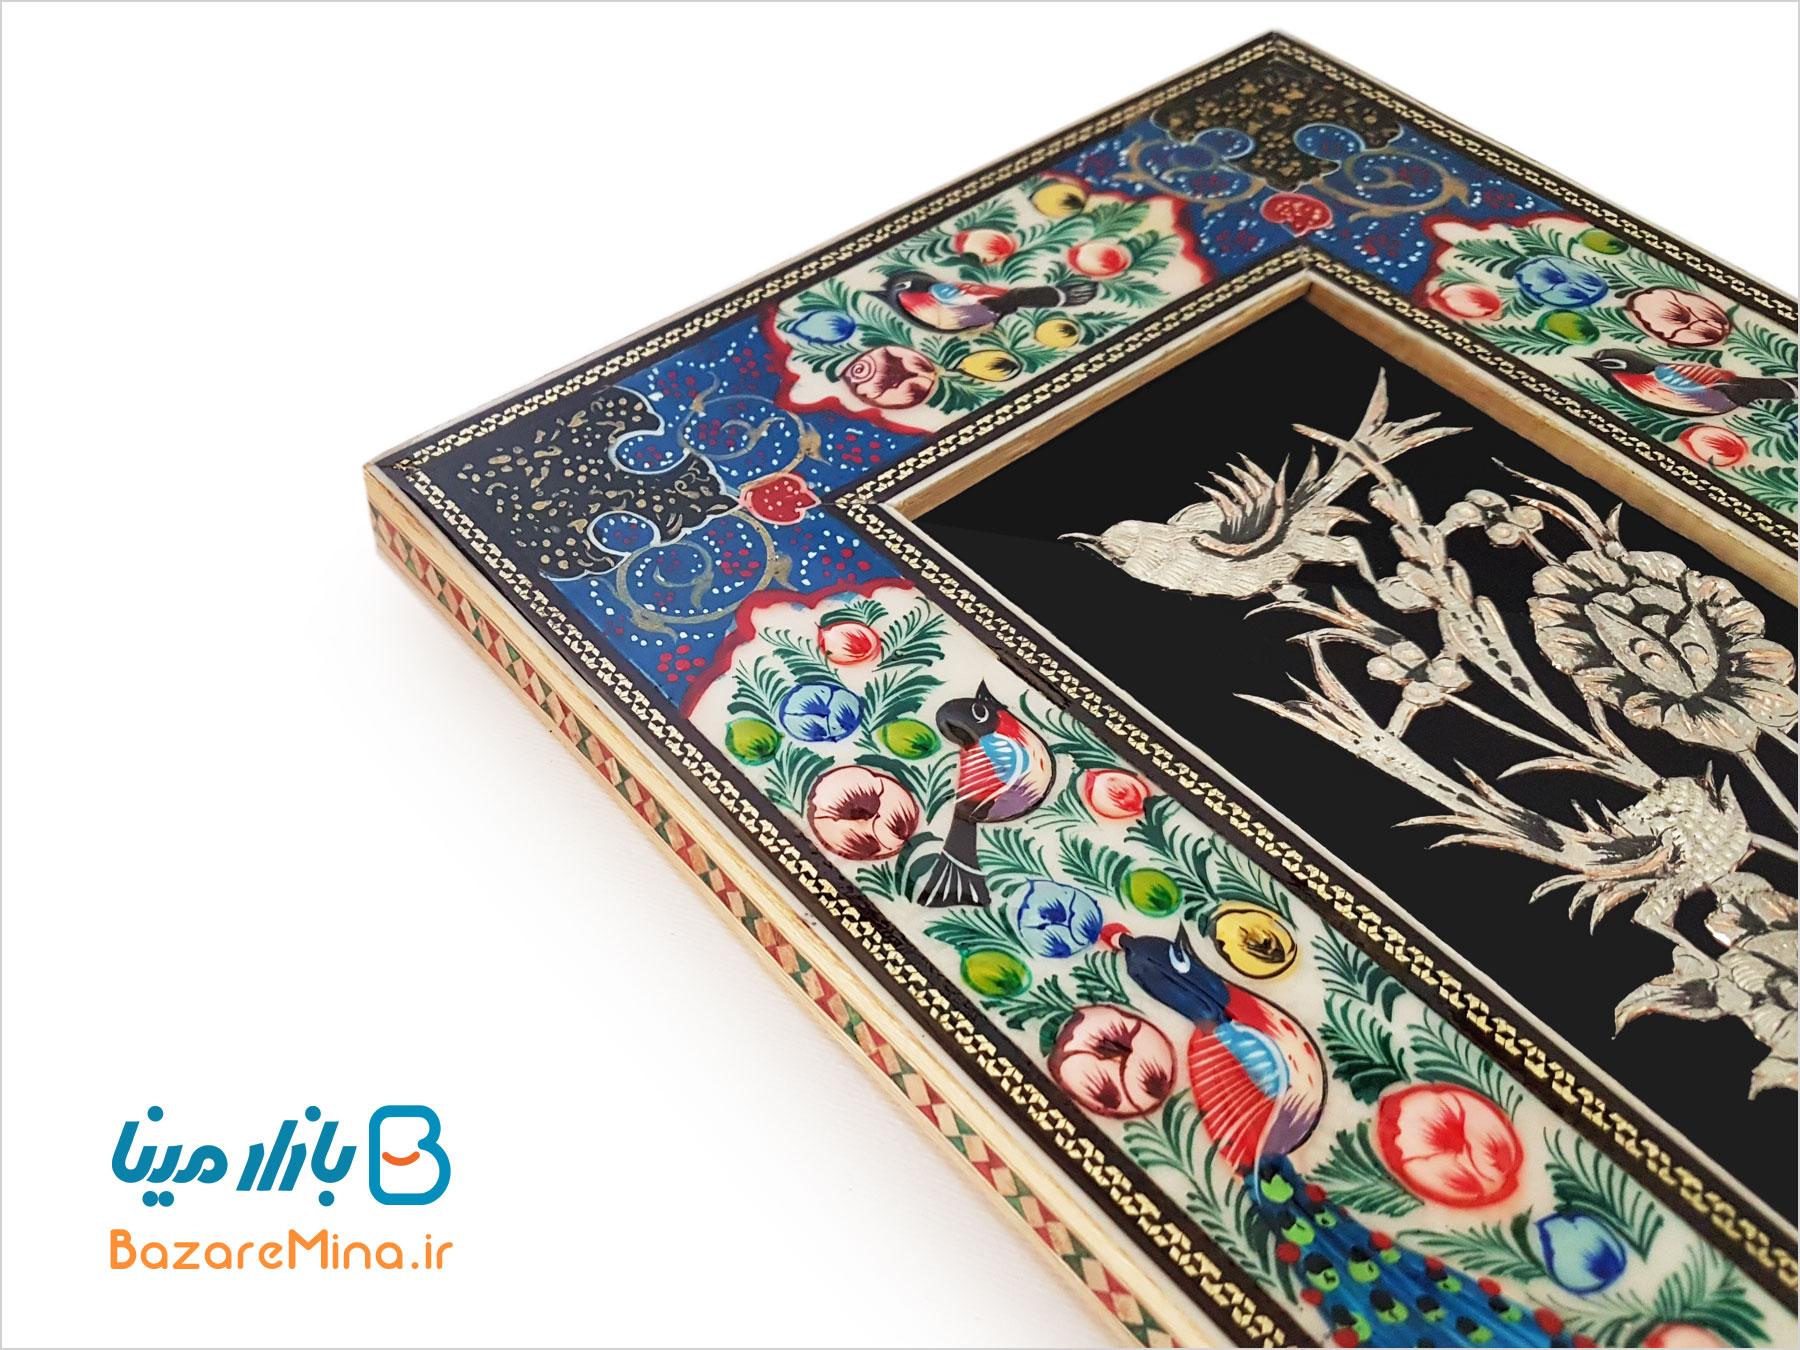 تابلو قلمزنی اصفهان